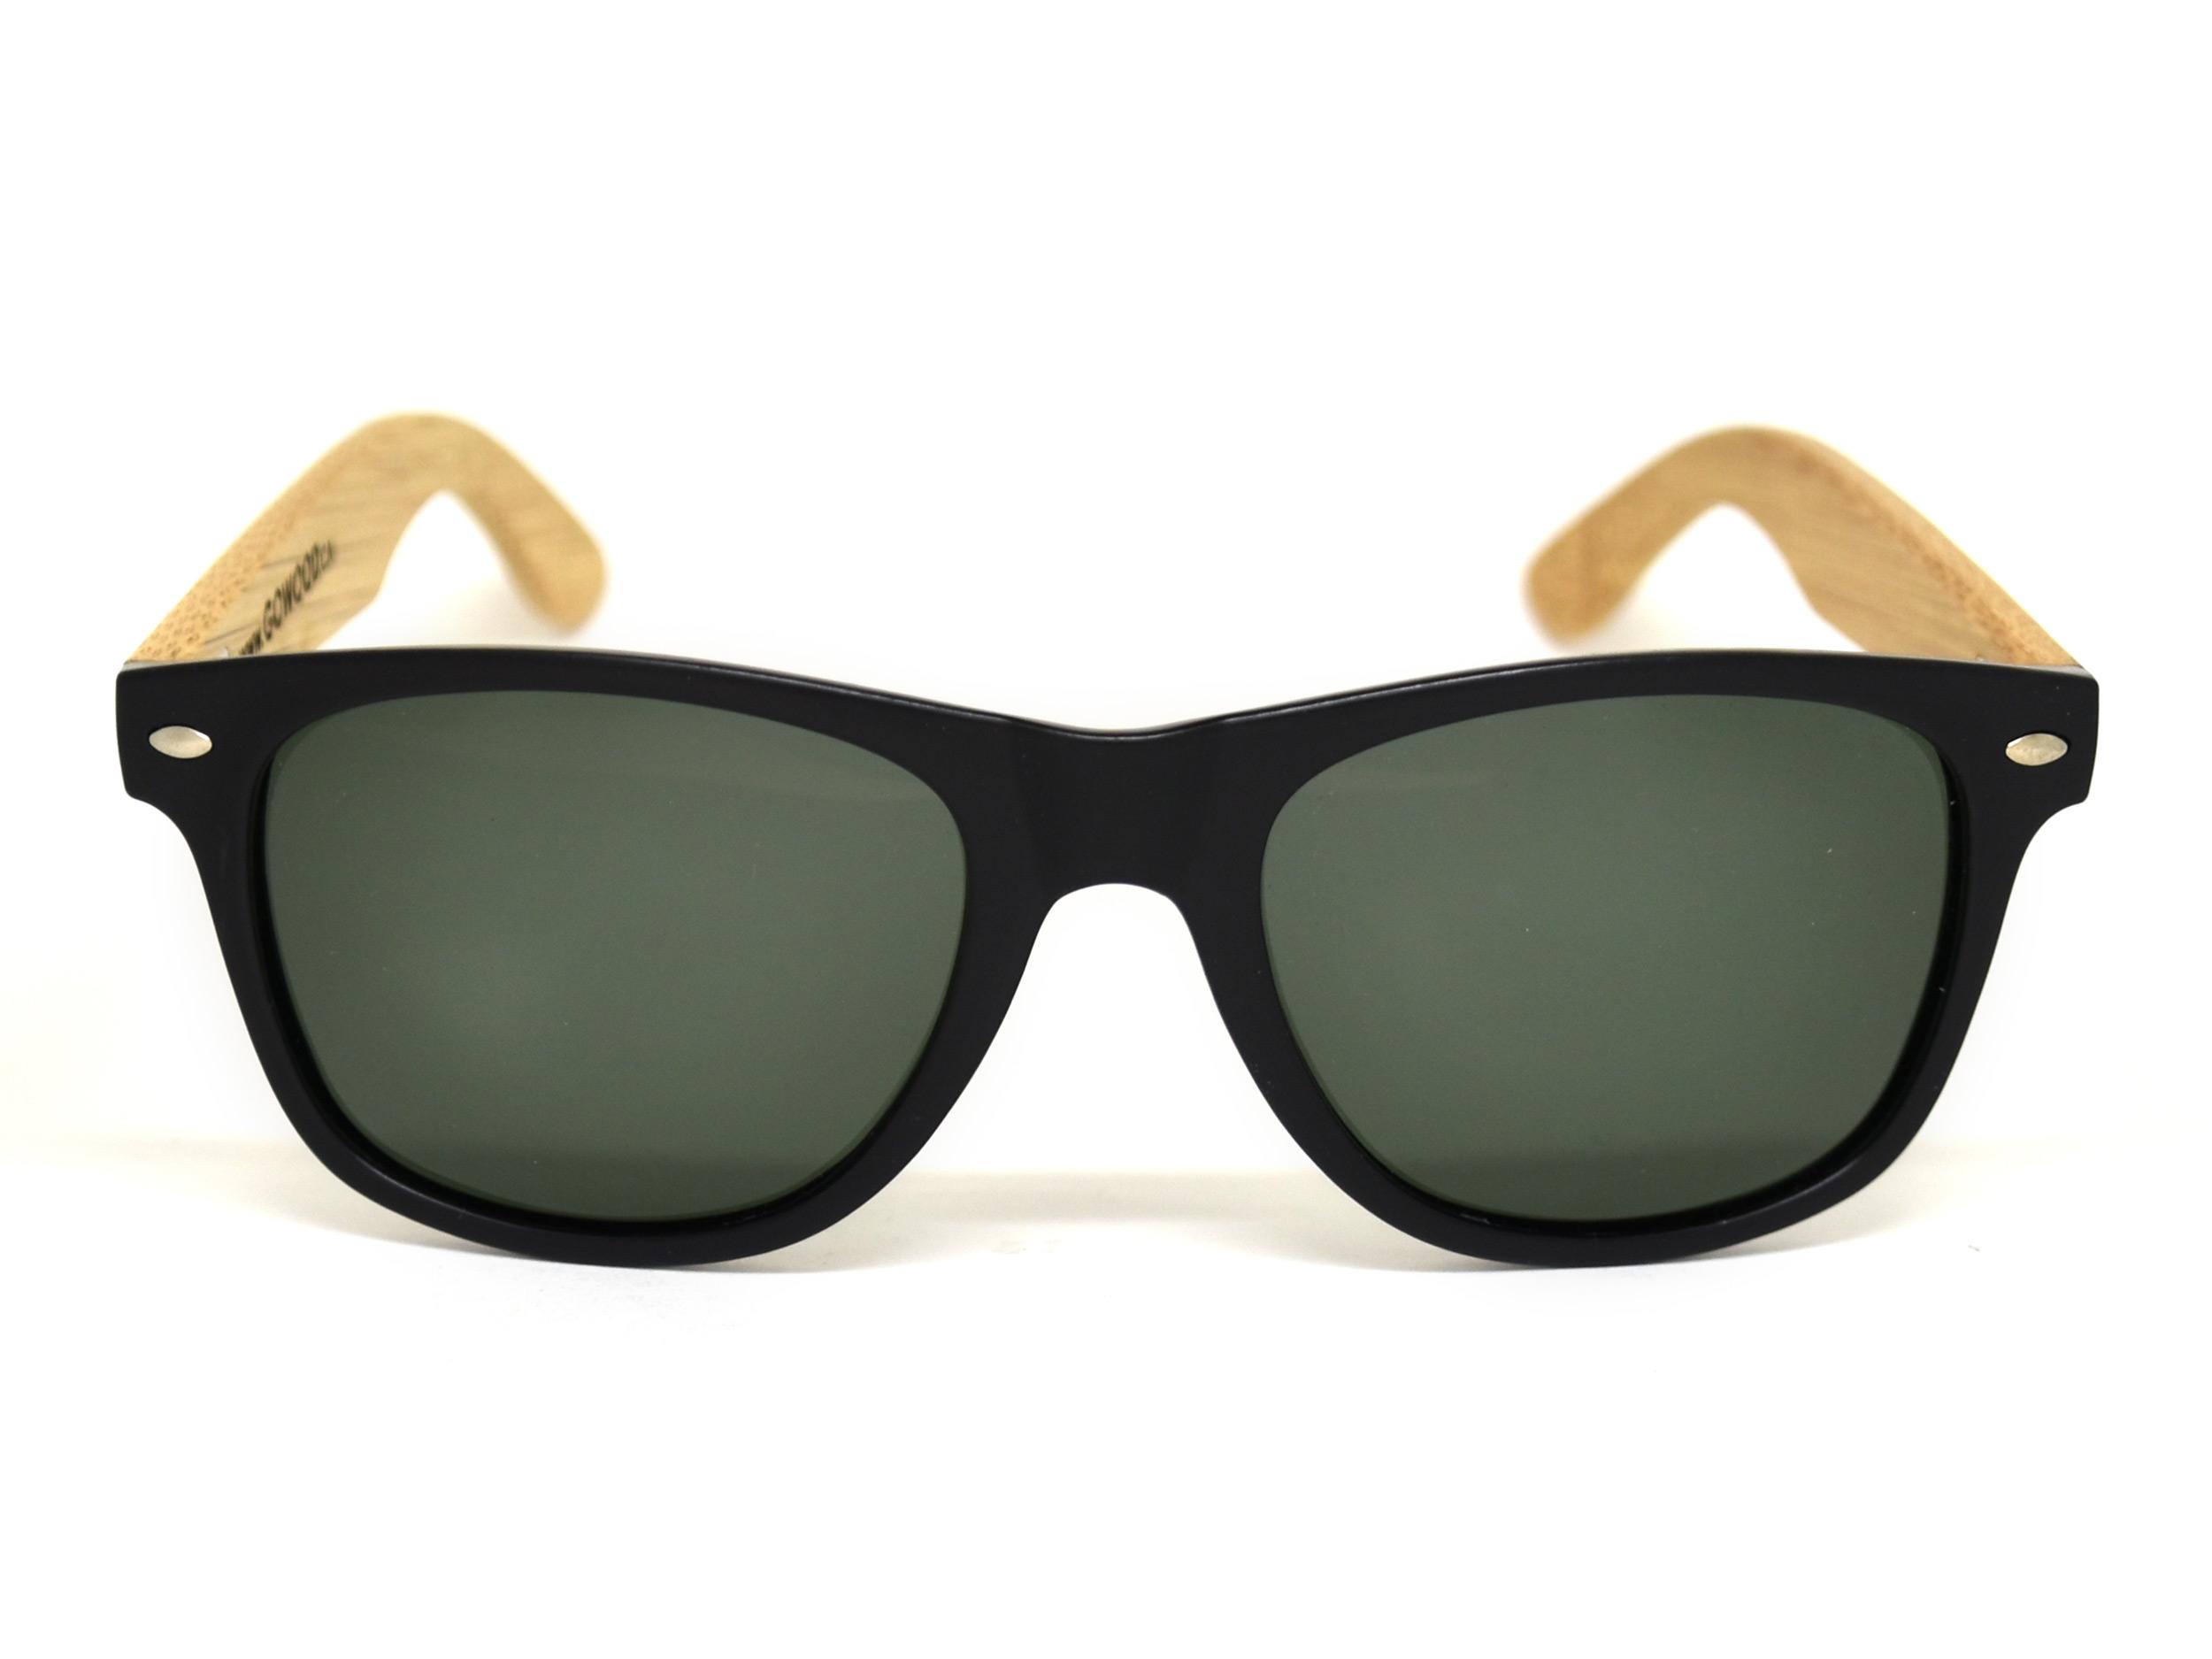 Wayfarer sunglasses Los Angeles front